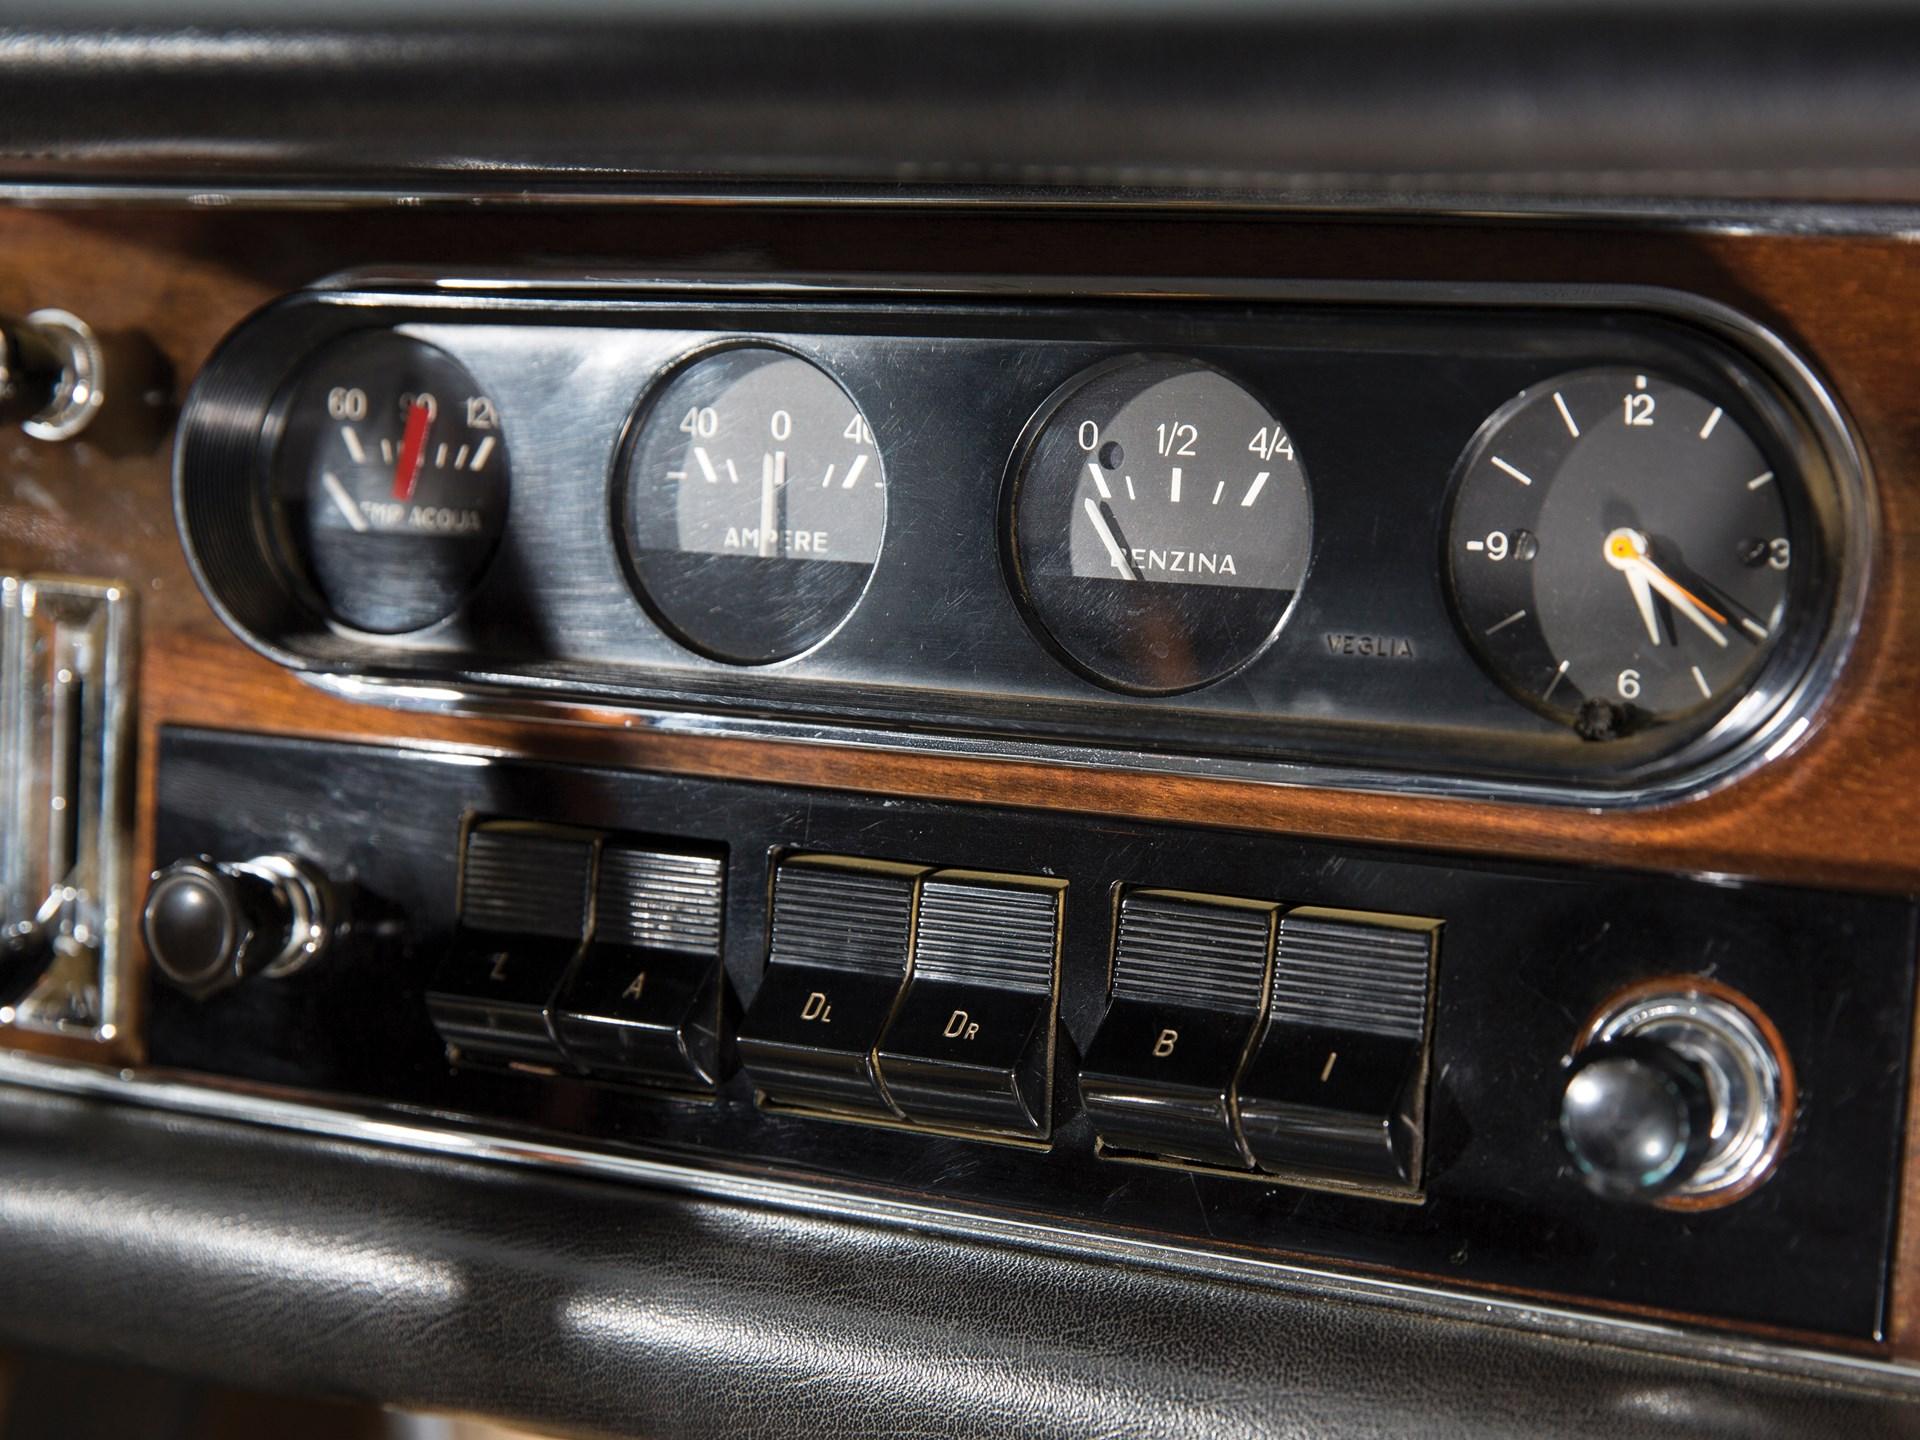 1965 Ferrari 275 GTB by Scaglietti